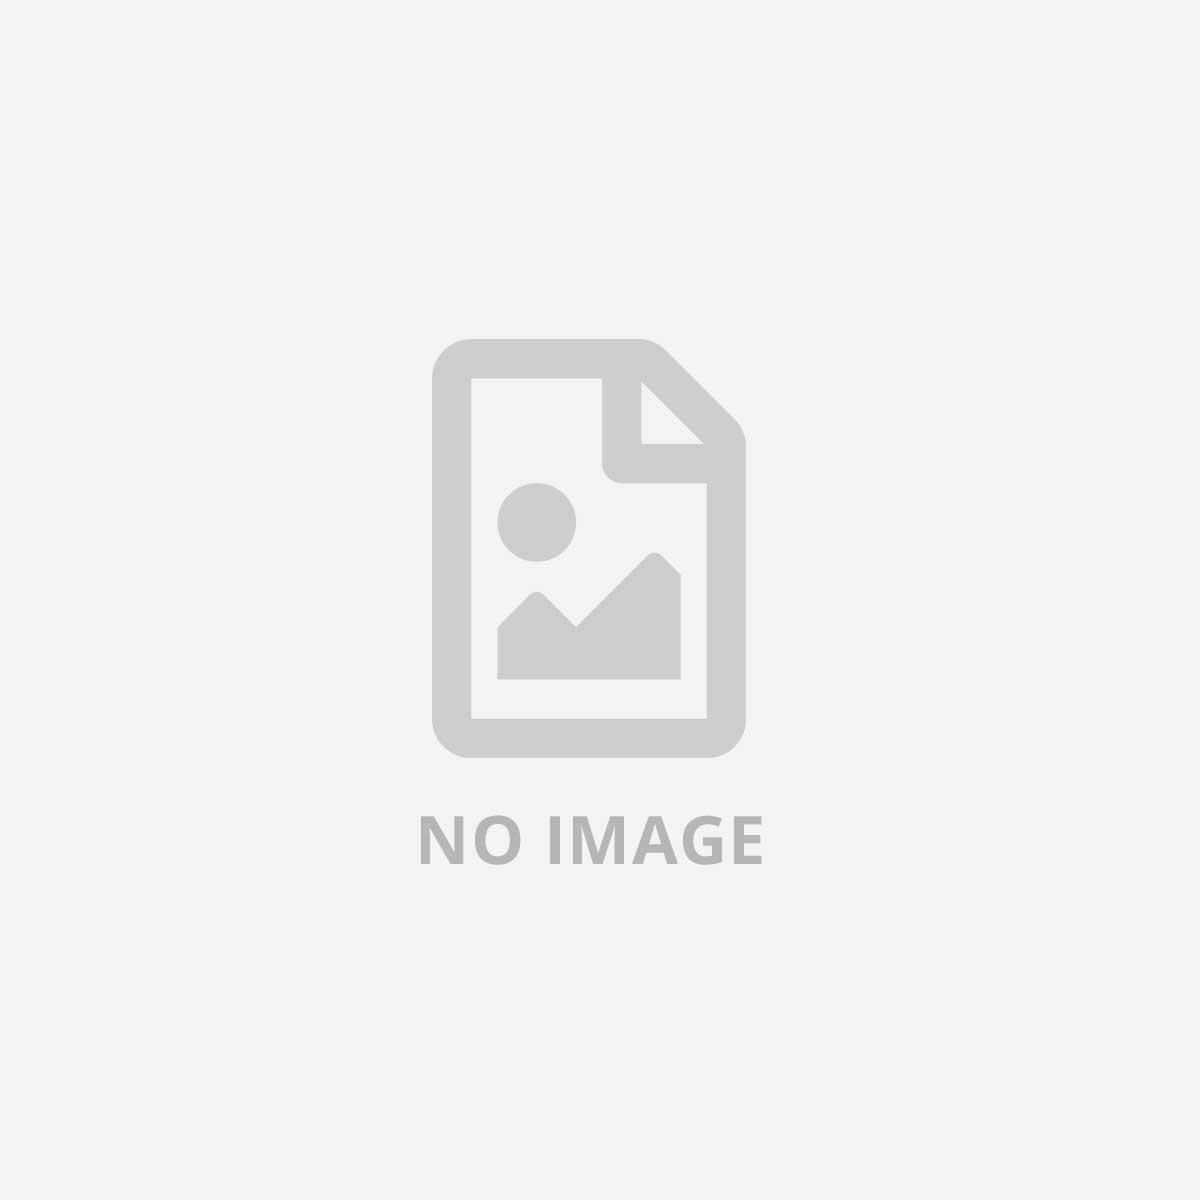 VARIOS DELL T1600 E3-1270 16GB 256 RIG